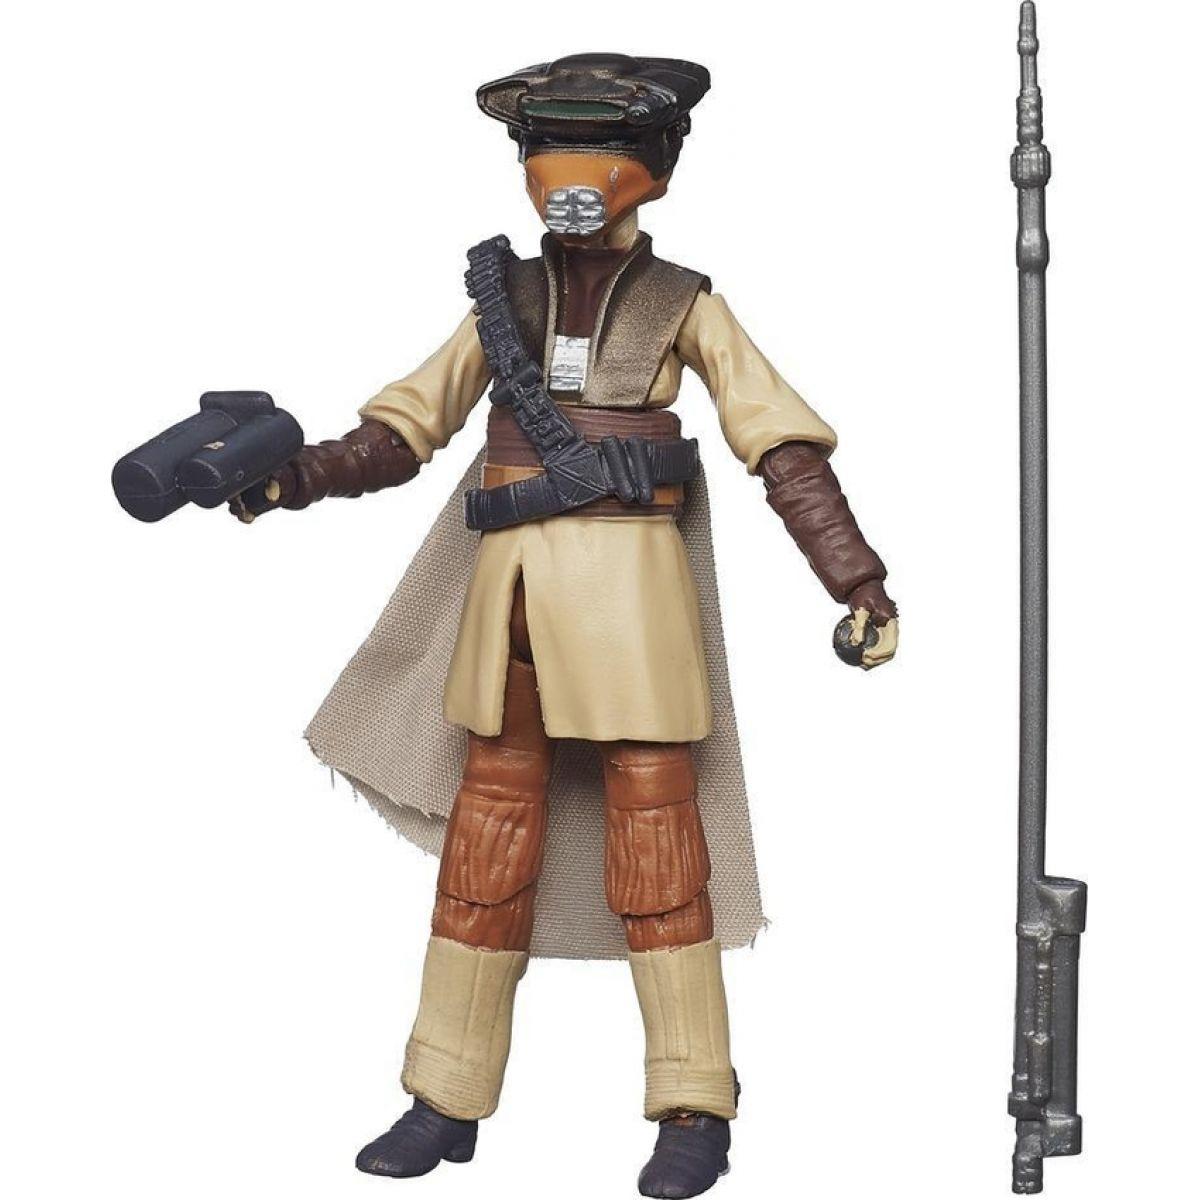 Hasbro Star Wars The Black Series - Princess Leia Organa